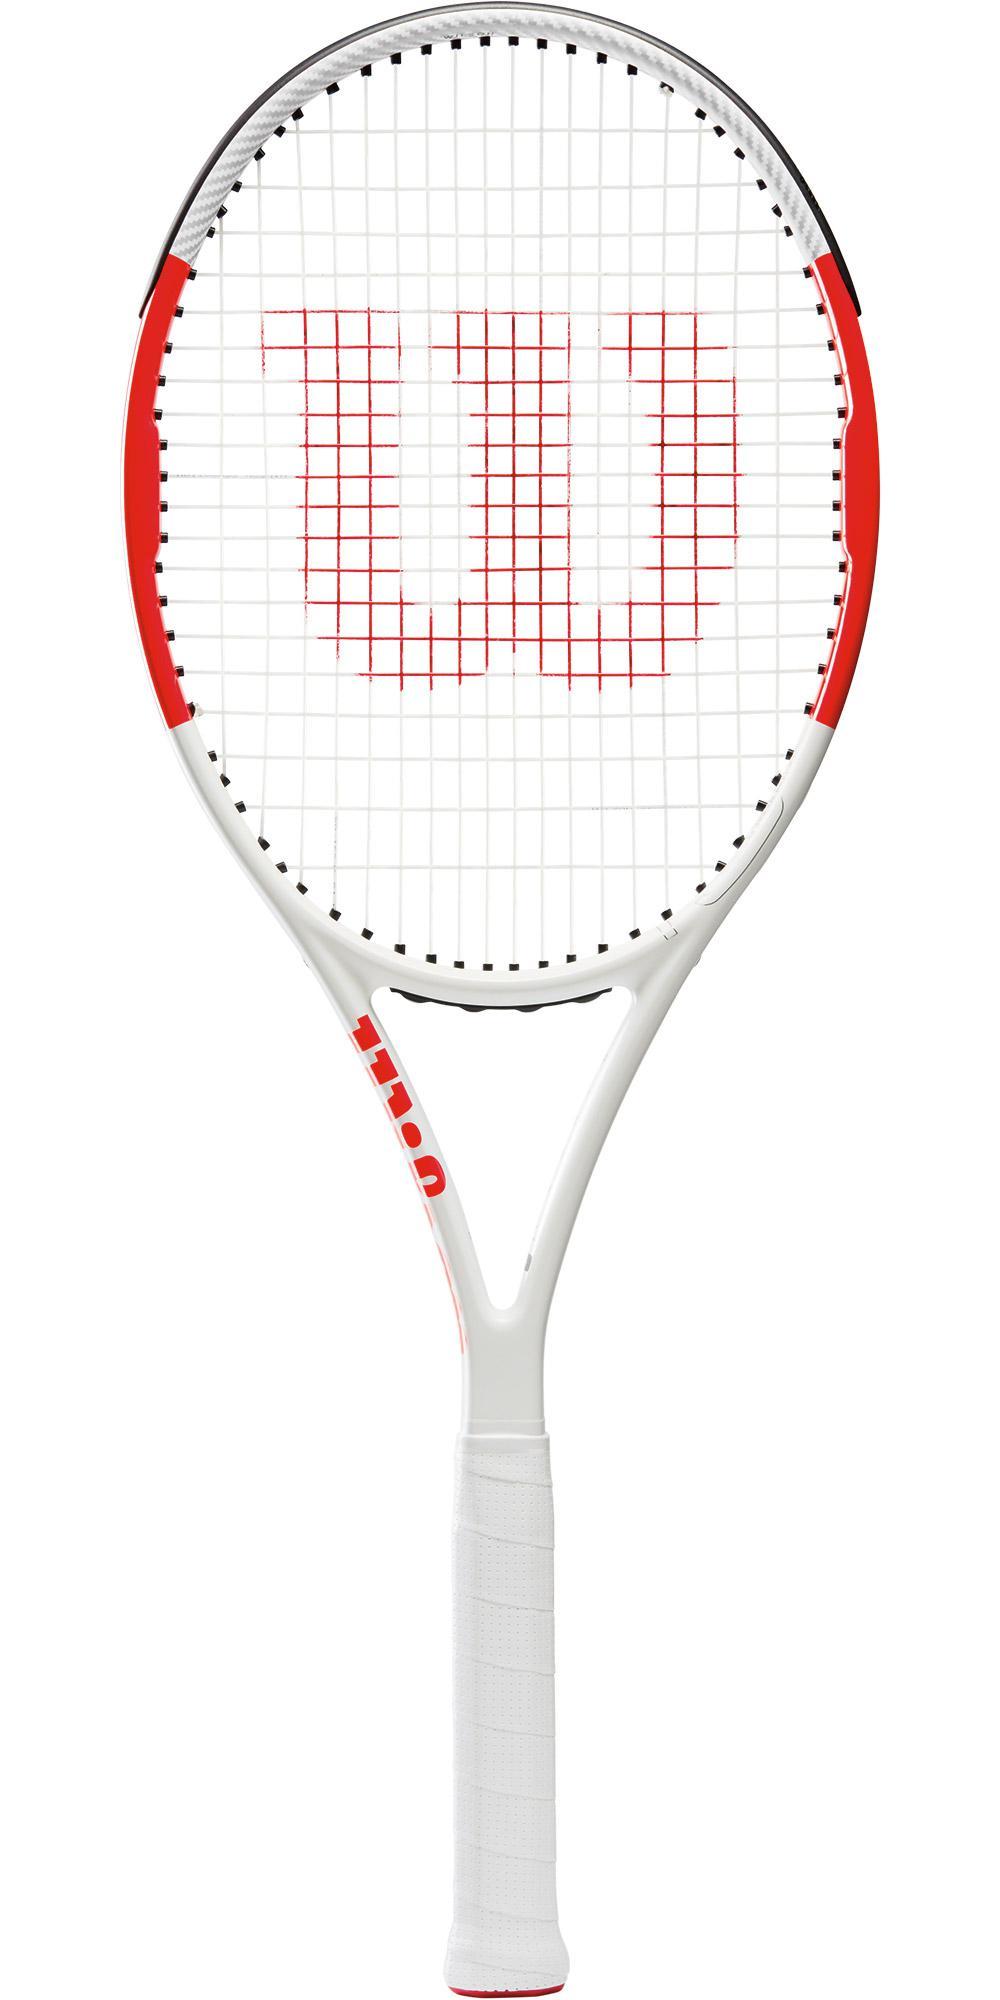 Wilson Six.One 95 Tennis Racket - White/Red - Tennisnuts.com